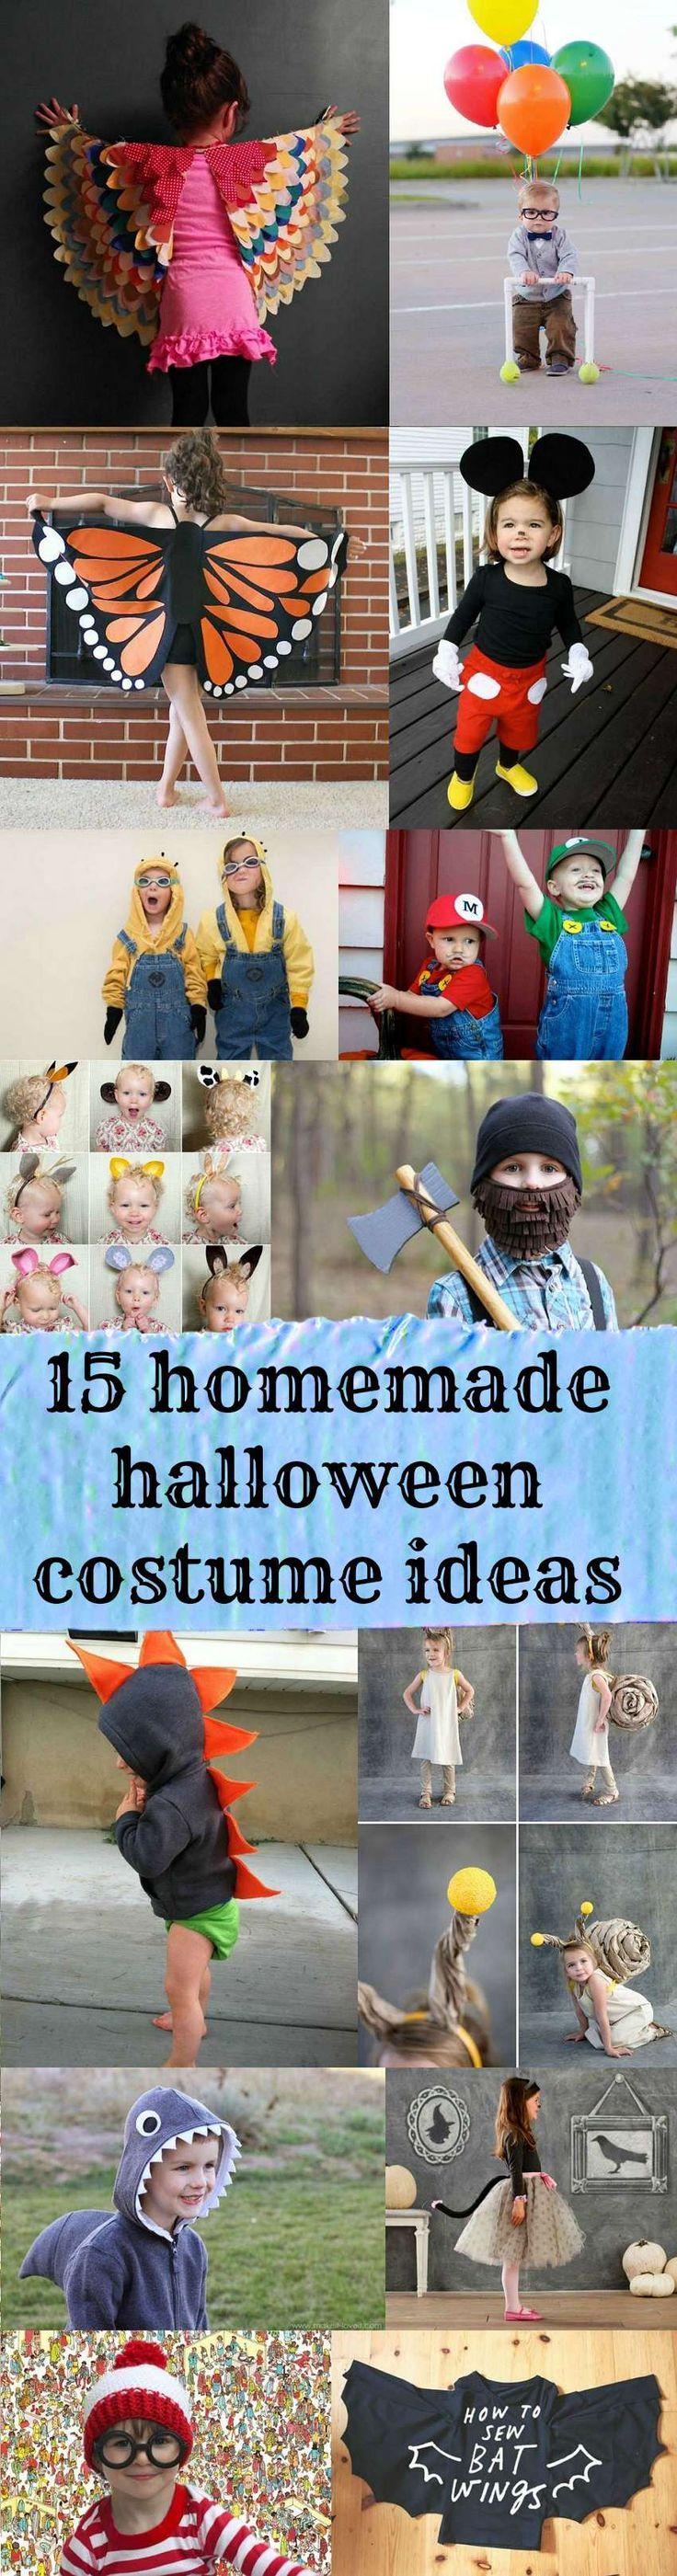 15 easy(ish) homemade Halloween costume ideas for kids!